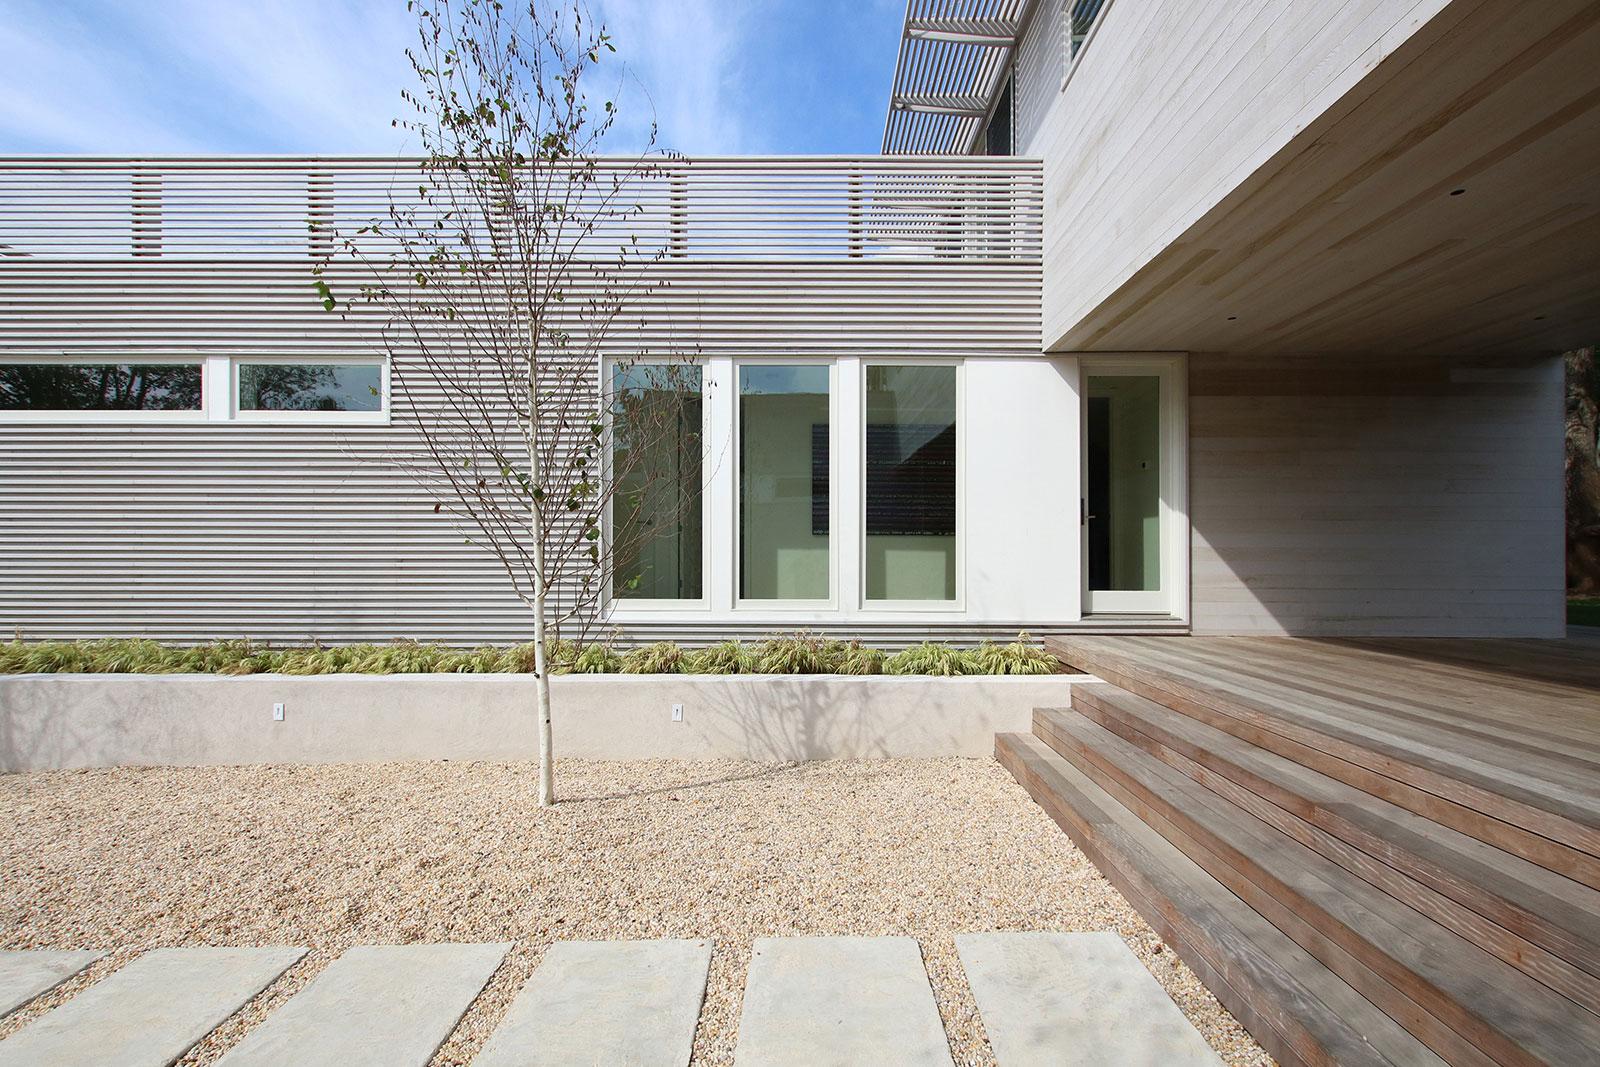 3-re4a-resolution-4-architecture-modern-modular-prefab-bridgehampton house-exterior.jpg